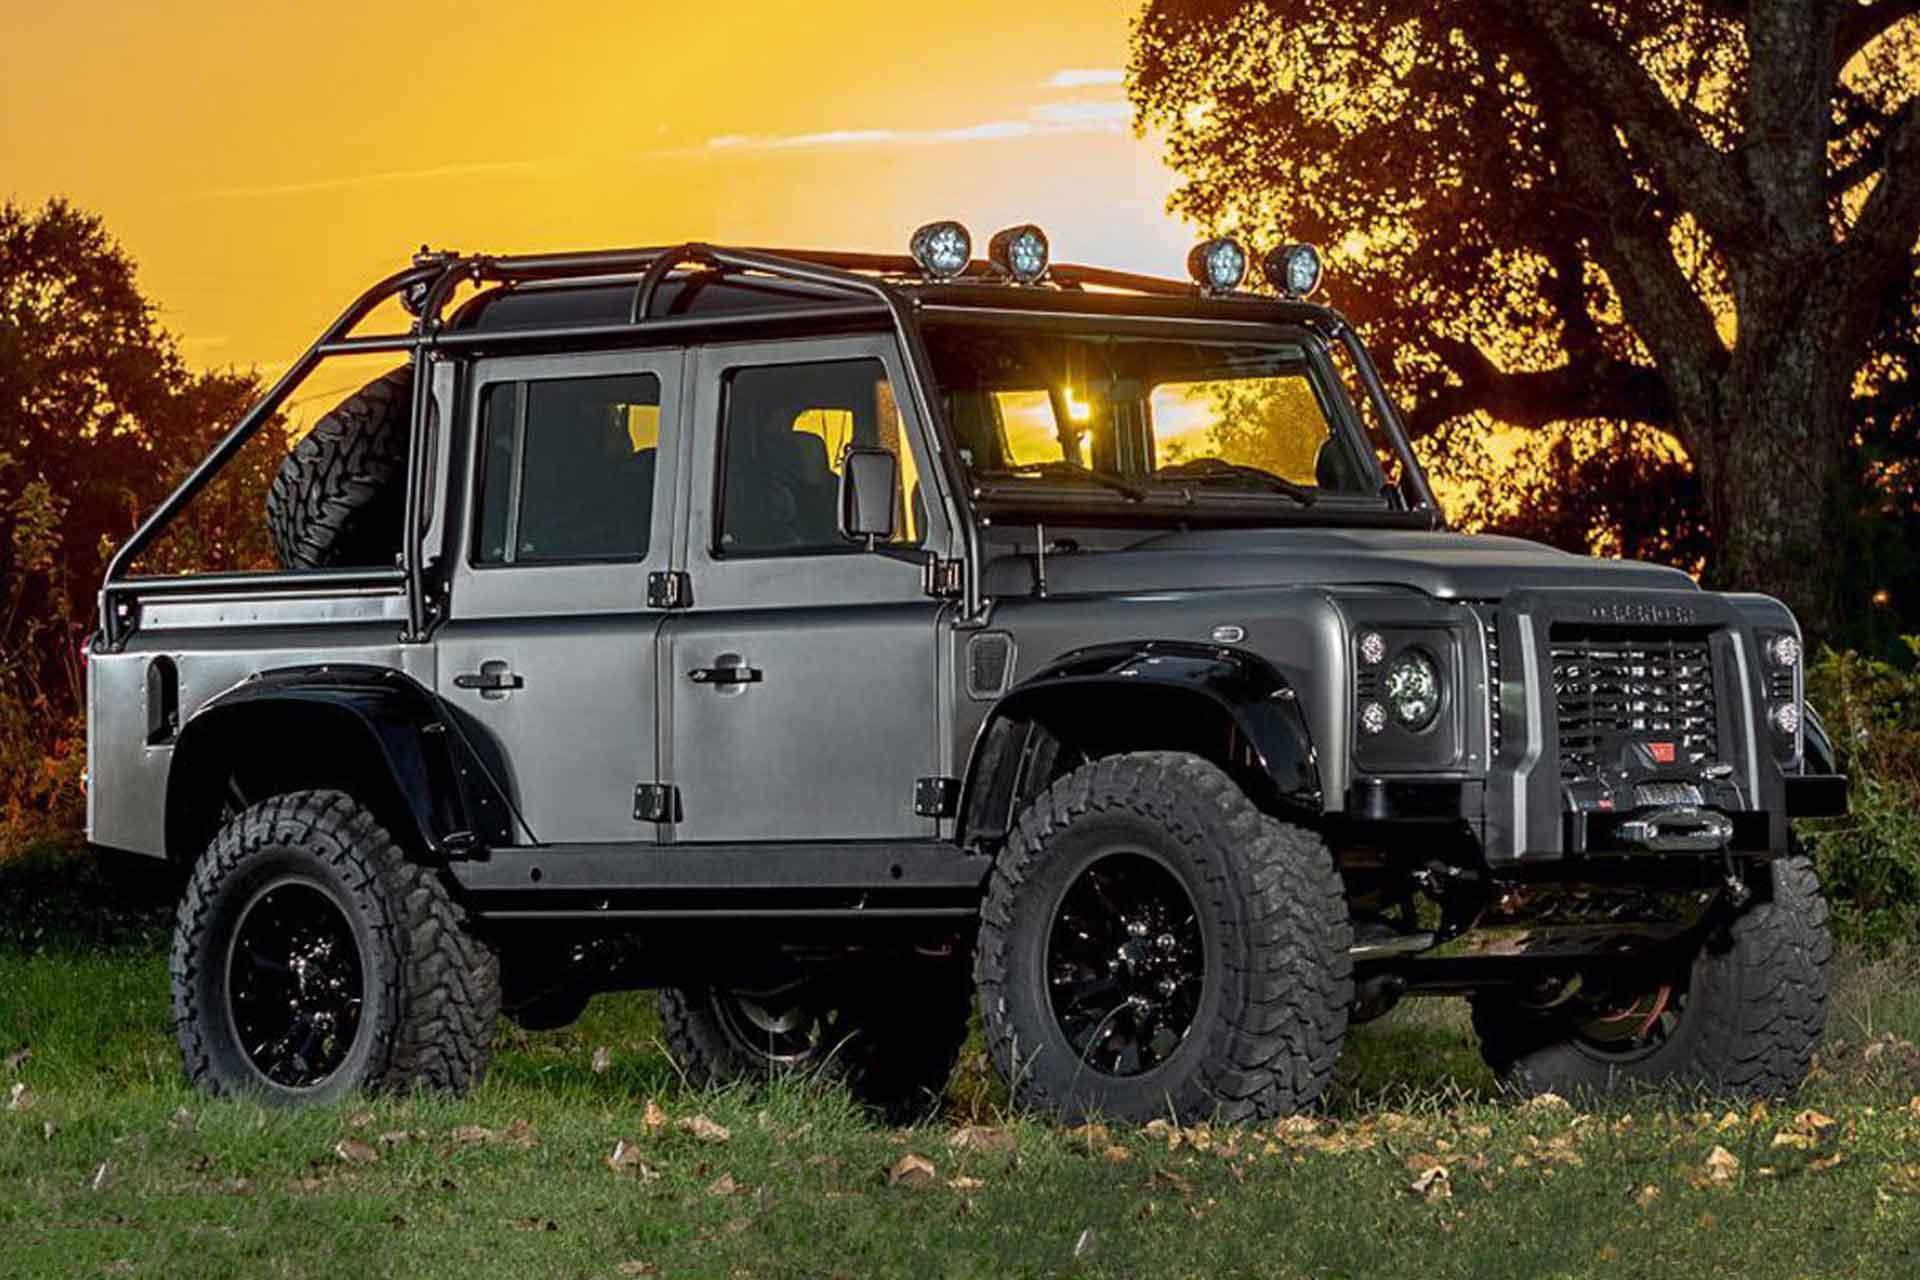 Himalaya Spectre Land Rover Defender SUV